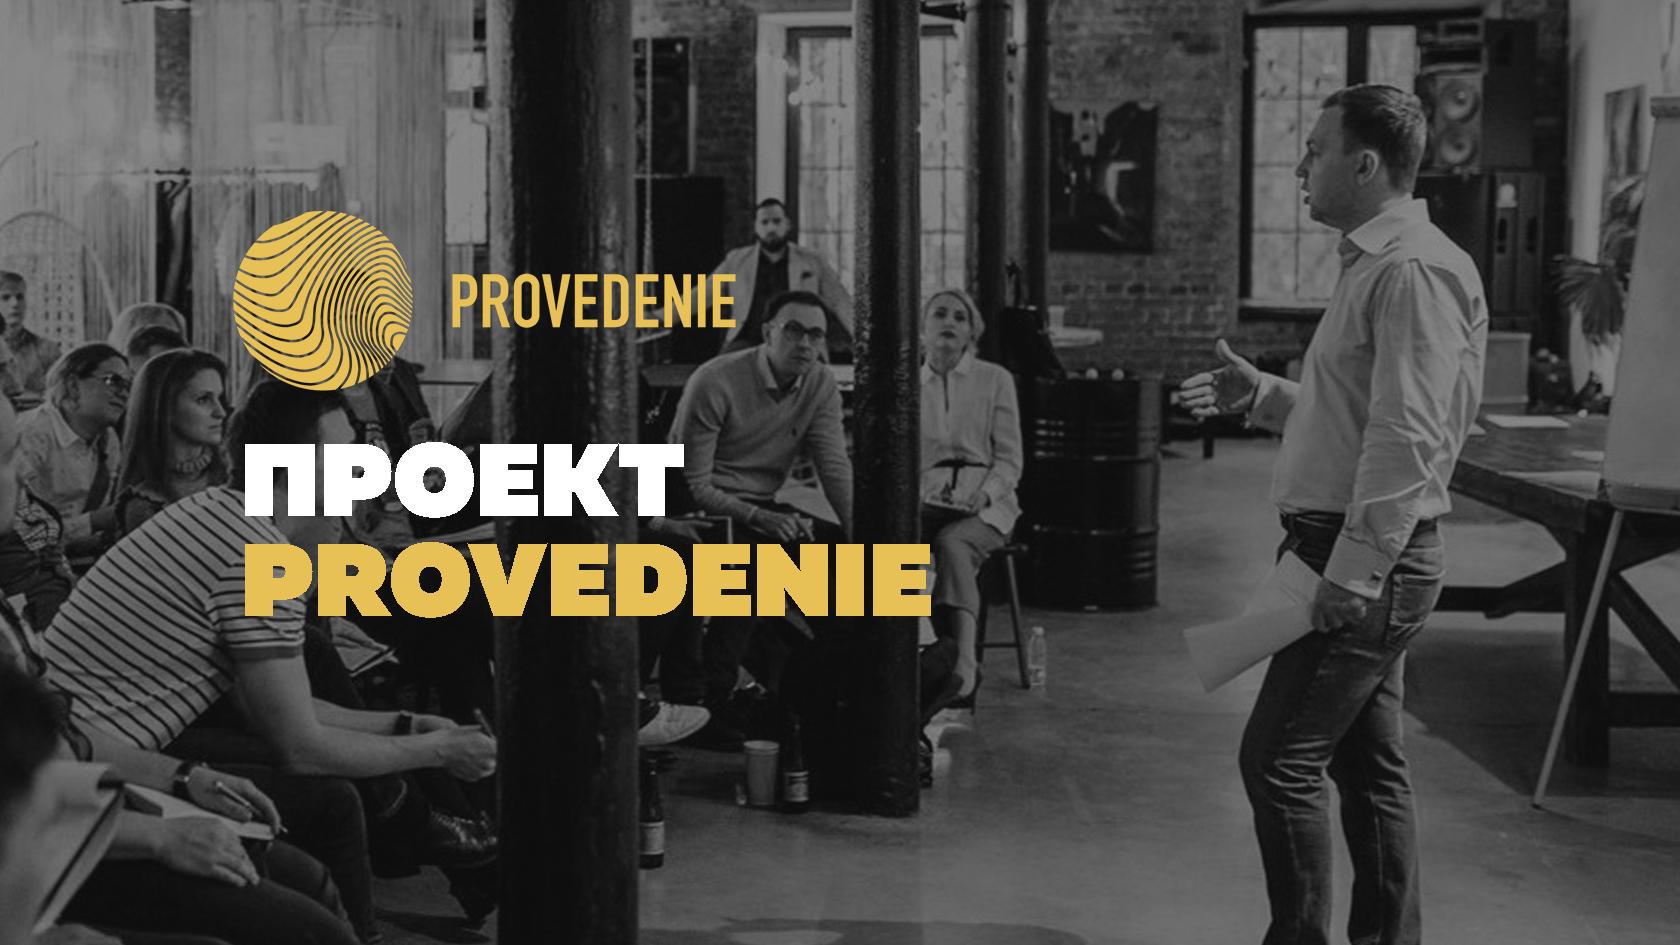 (c) Provedenie.org